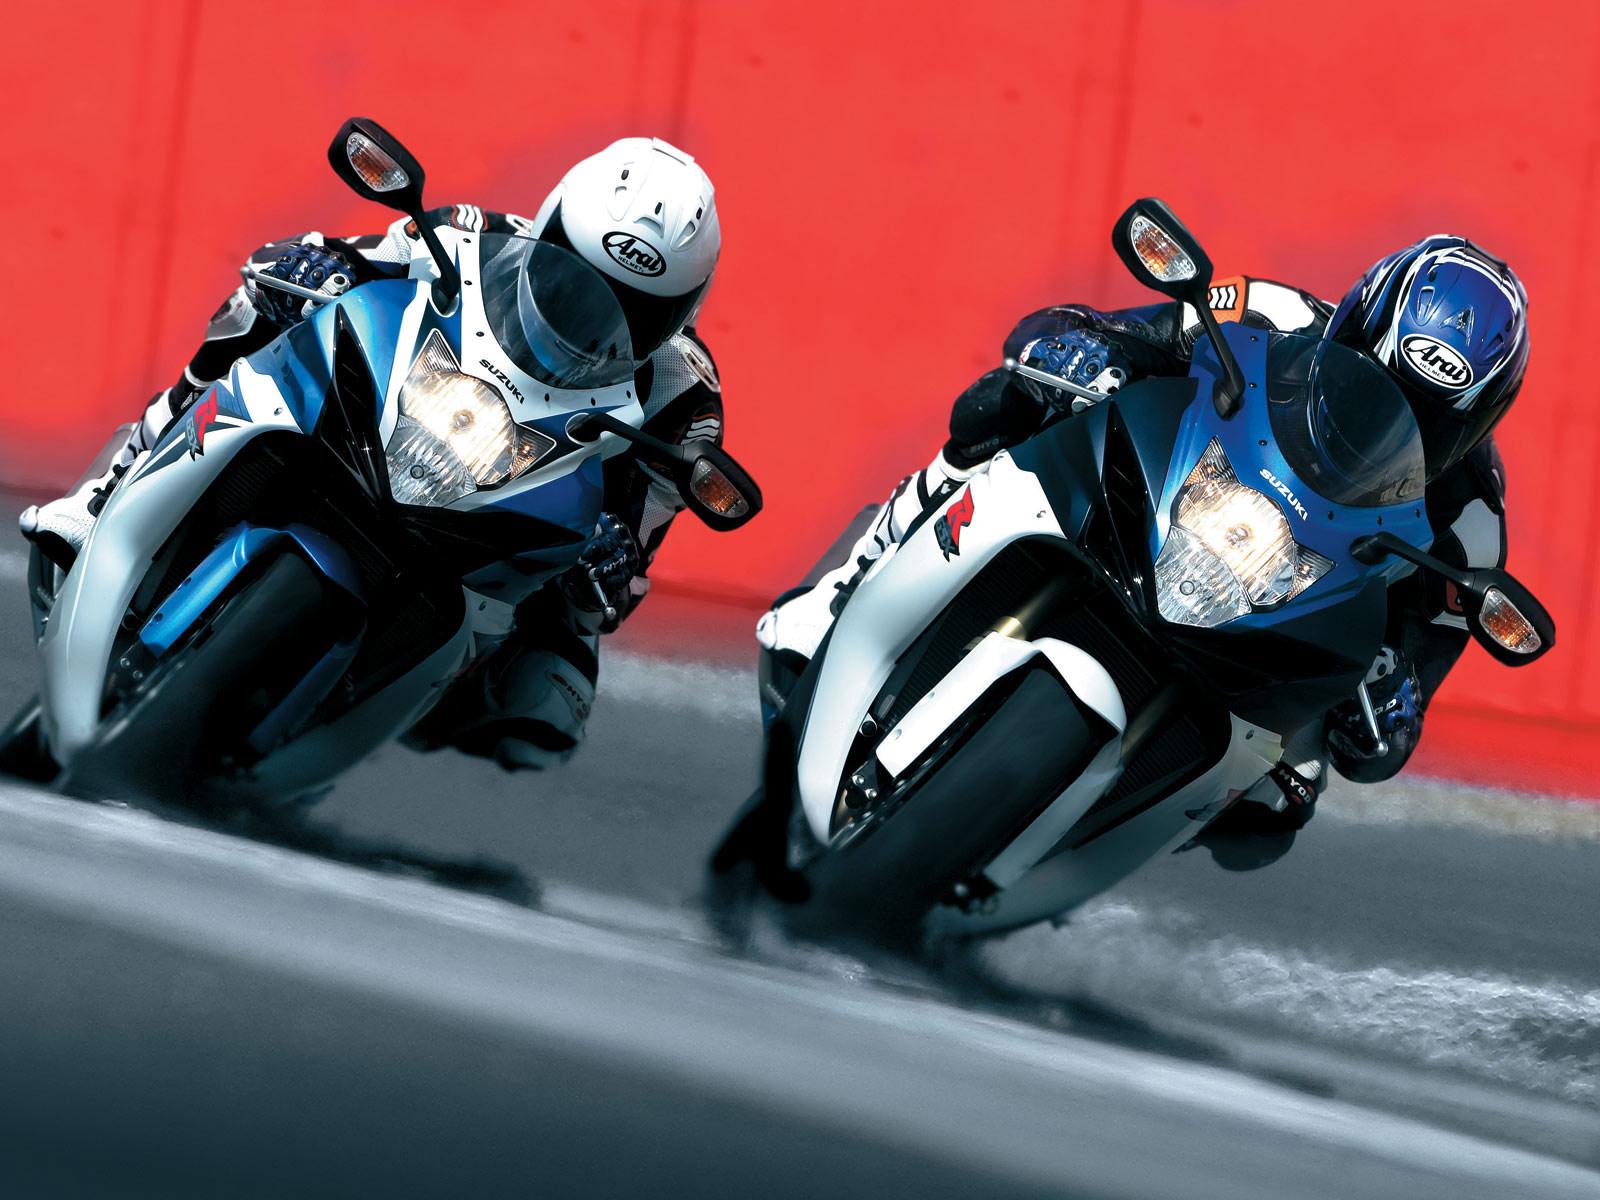 http://4.bp.blogspot.com/-hdcKLB6LrK4/TuVSiXgOpbI/AAAAAAAAFPw/OxwSWAr2rMs/s1600/2011_Suzuki_GSX-R_600_motorcycle-desktop-wallpaper_06.jpg